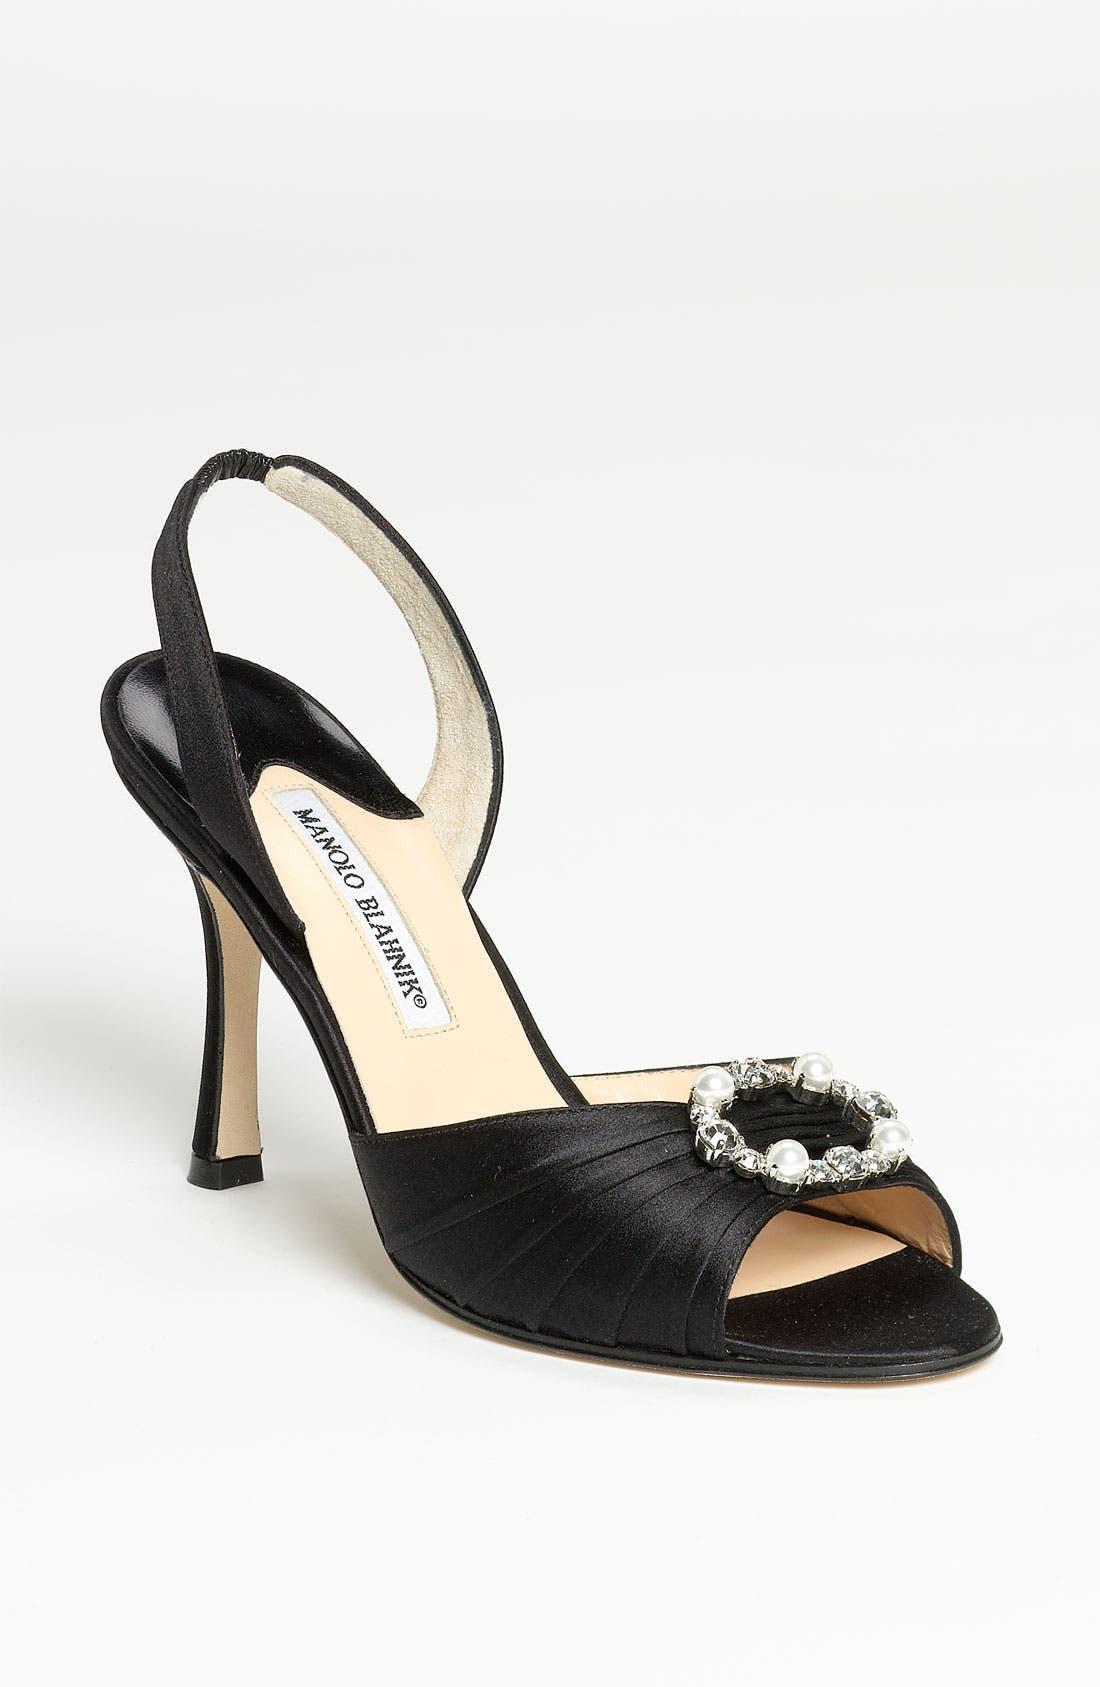 Main Image - Manolo Blahnik 'Sedaraby' Embellished Slingback Sandal